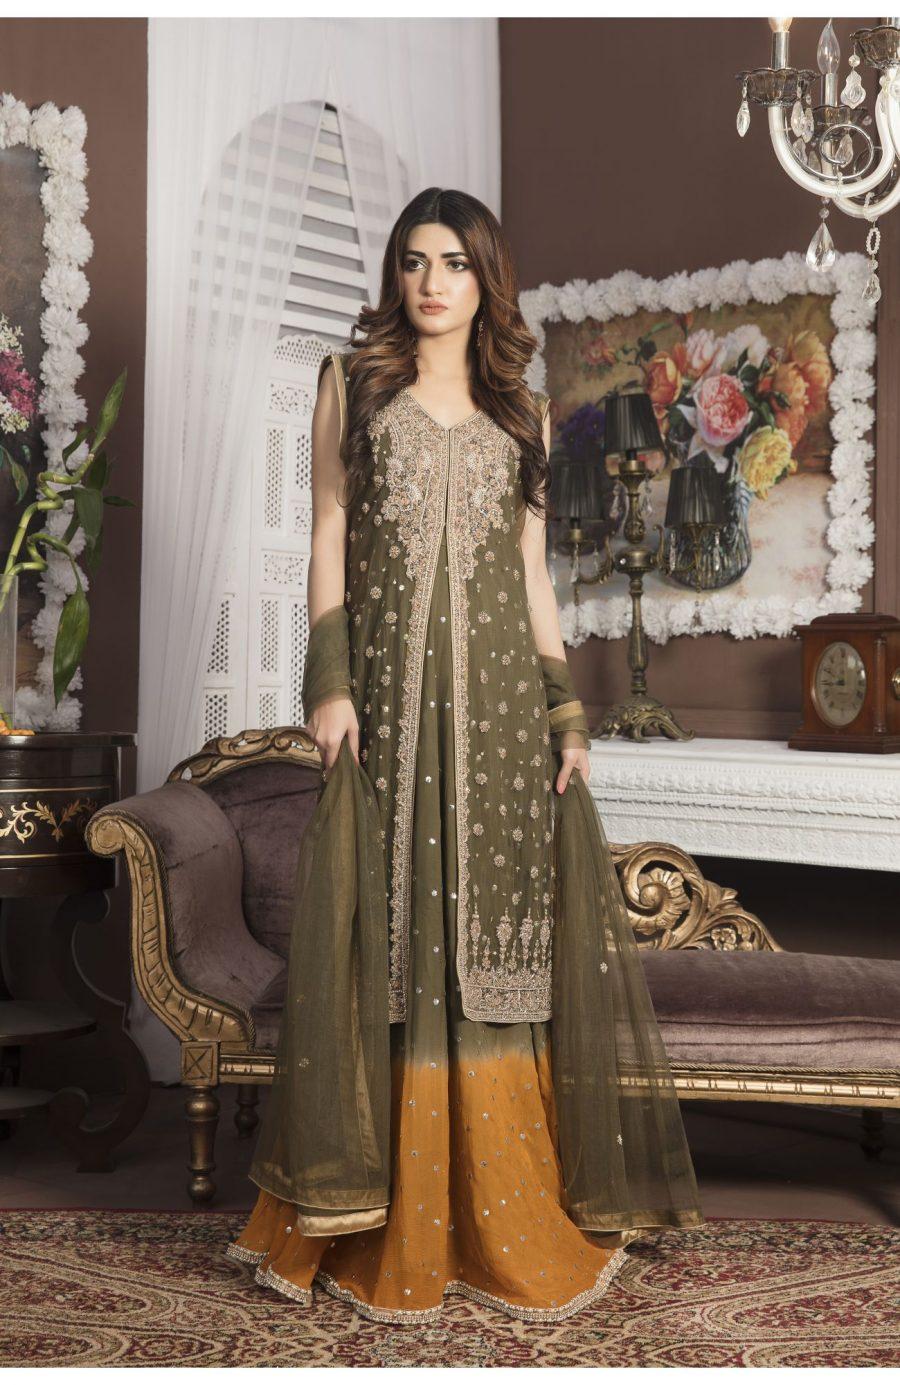 Finest Stani Wedding Dresses Online Uk Dress With Designer Asian